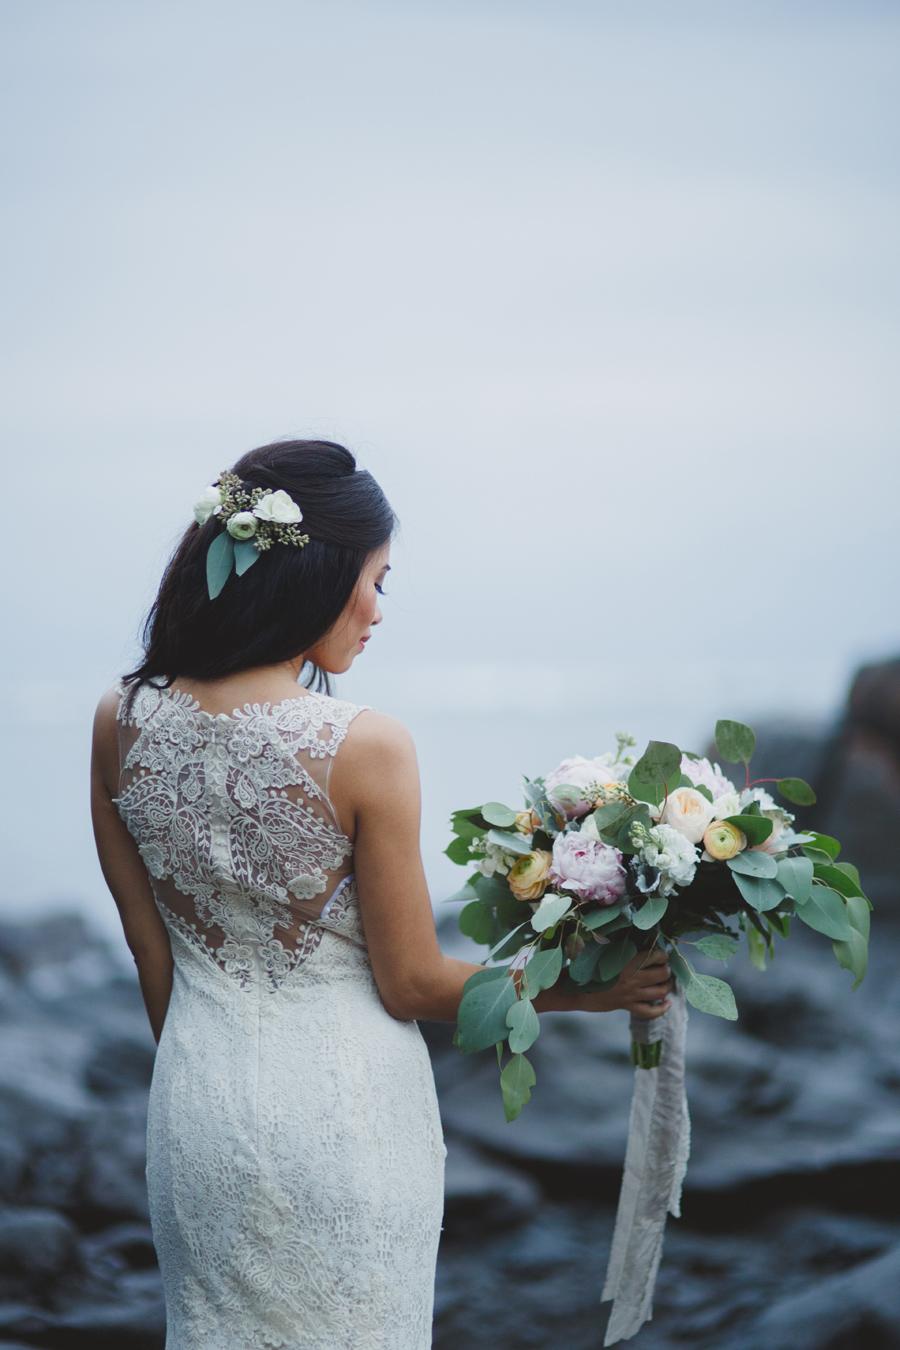 sunya's wedding flowers photographer